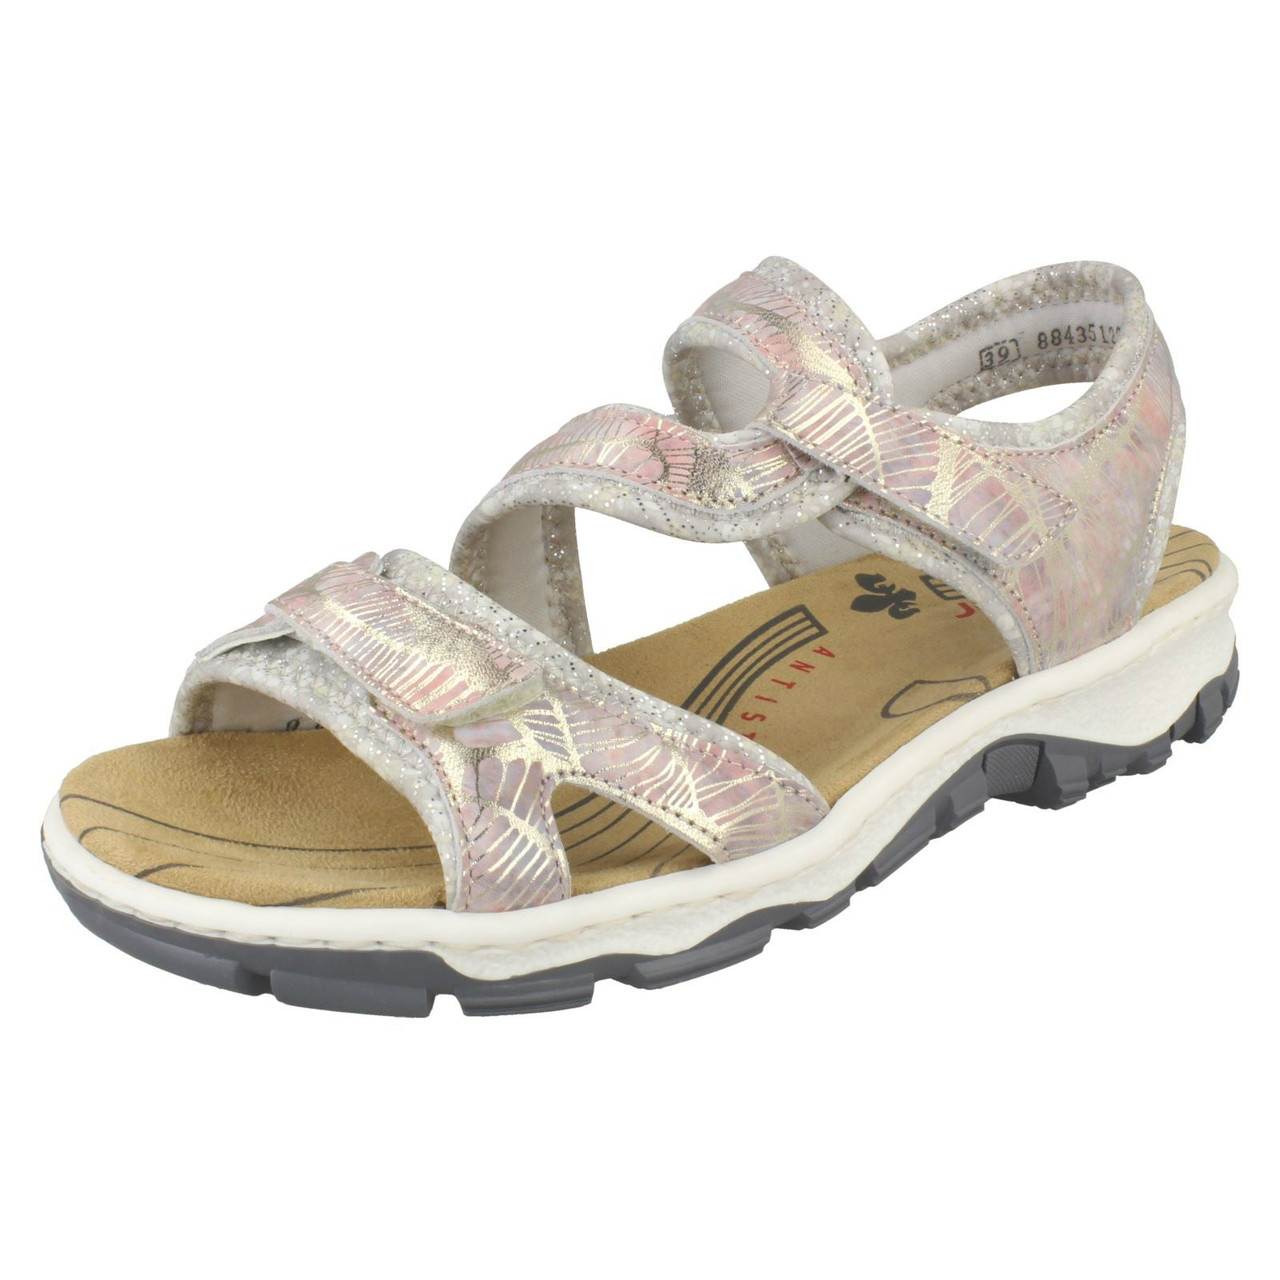 Ladies Rieker T-Bar Smart Sandals /'63478/'